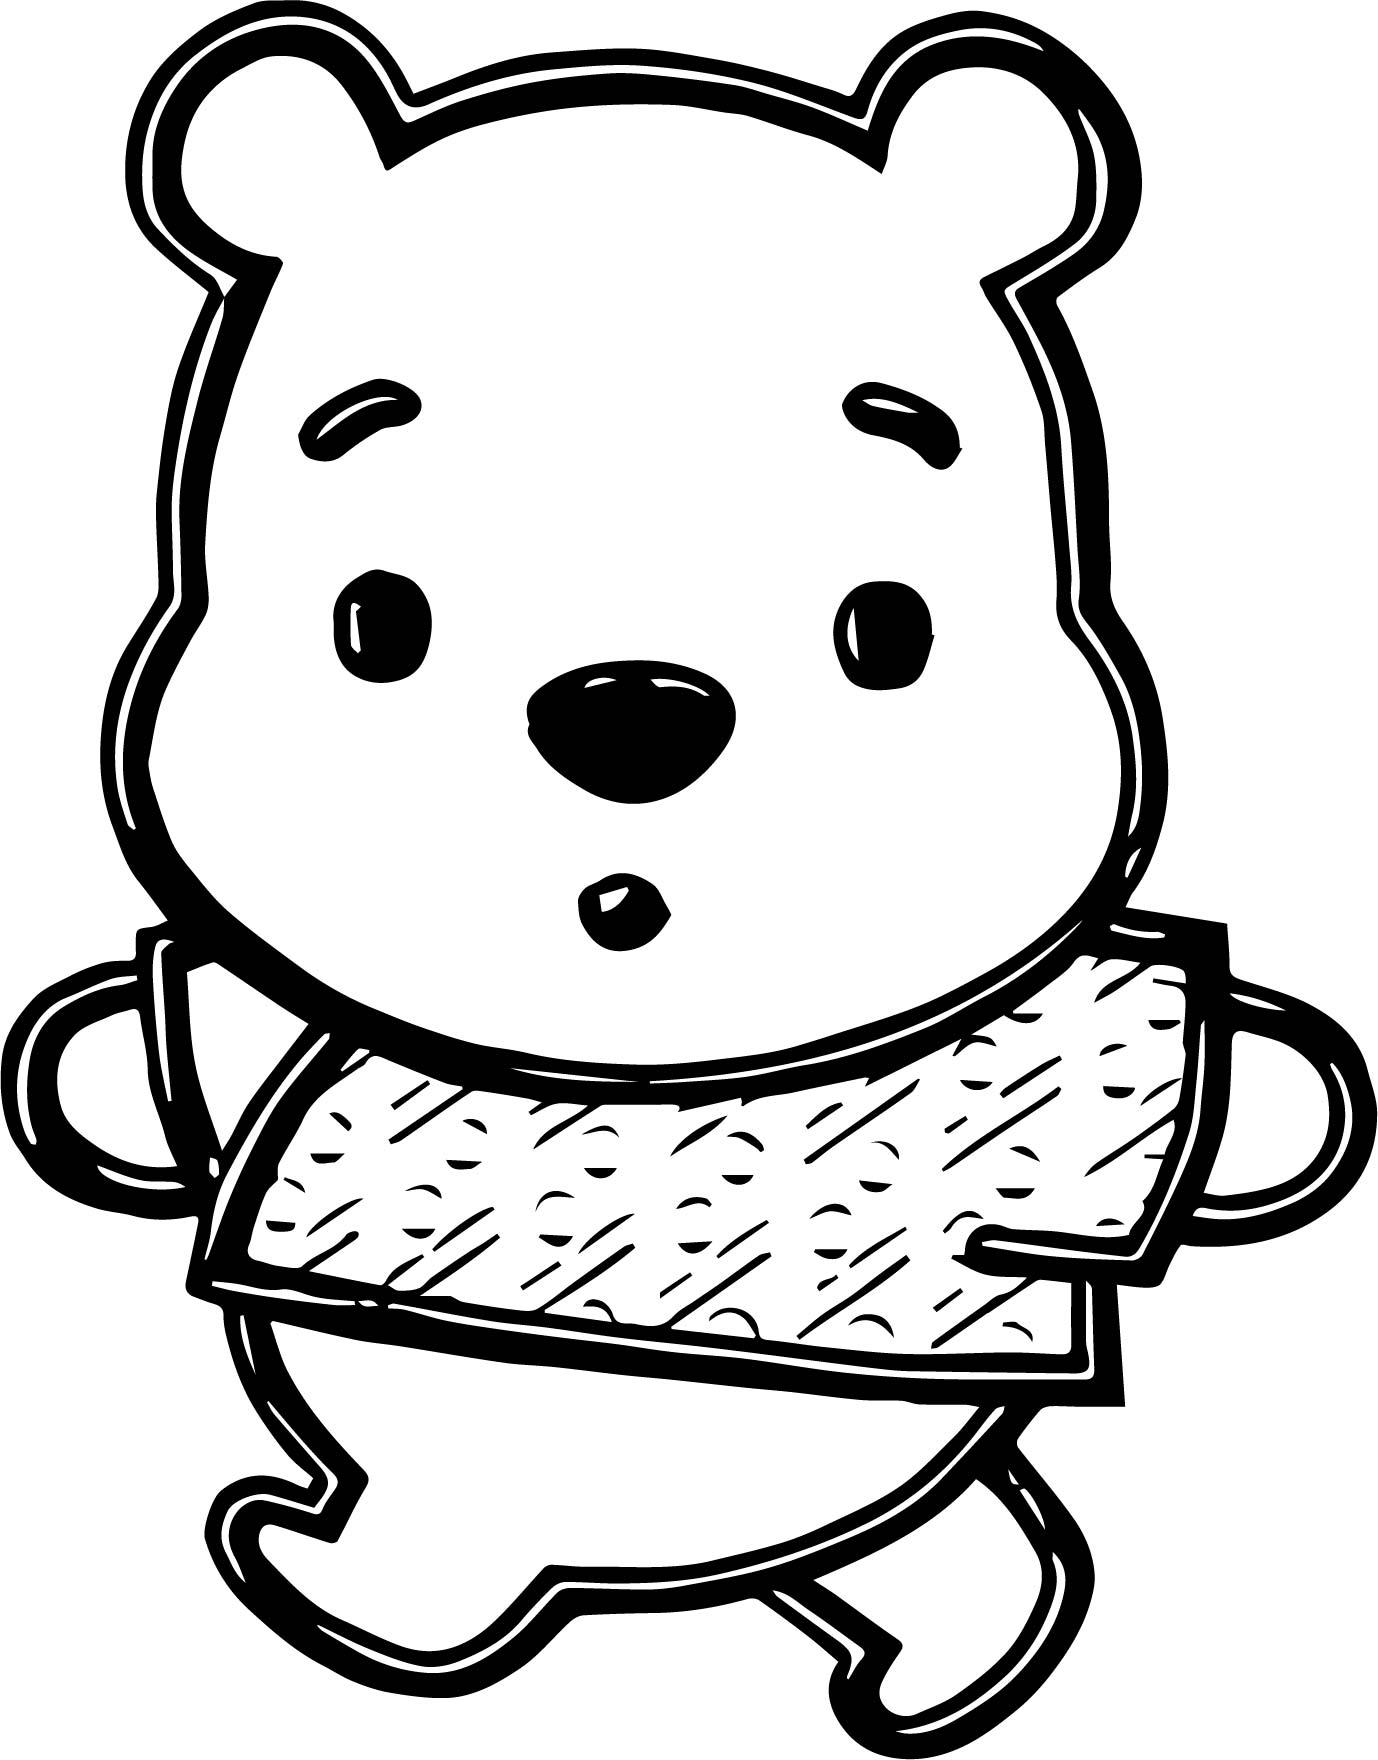 1378x1760 Baby Pooh Chibi Walking Coloring Page Wecoloringpage